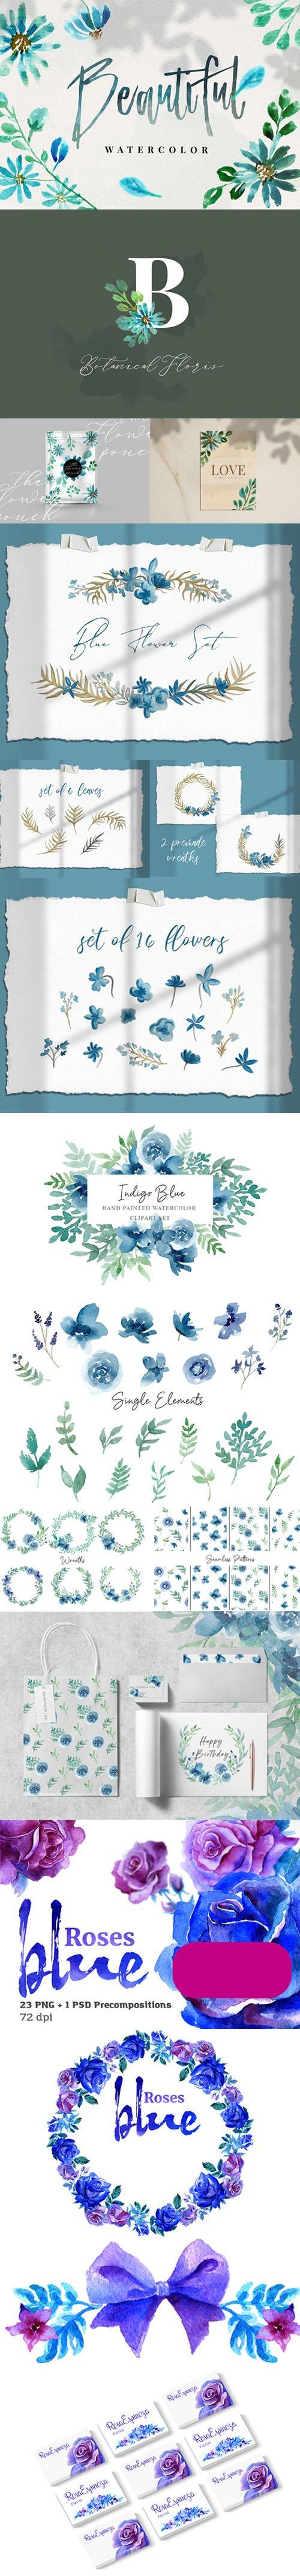 90+ Gracious Blue Watercolor Collection